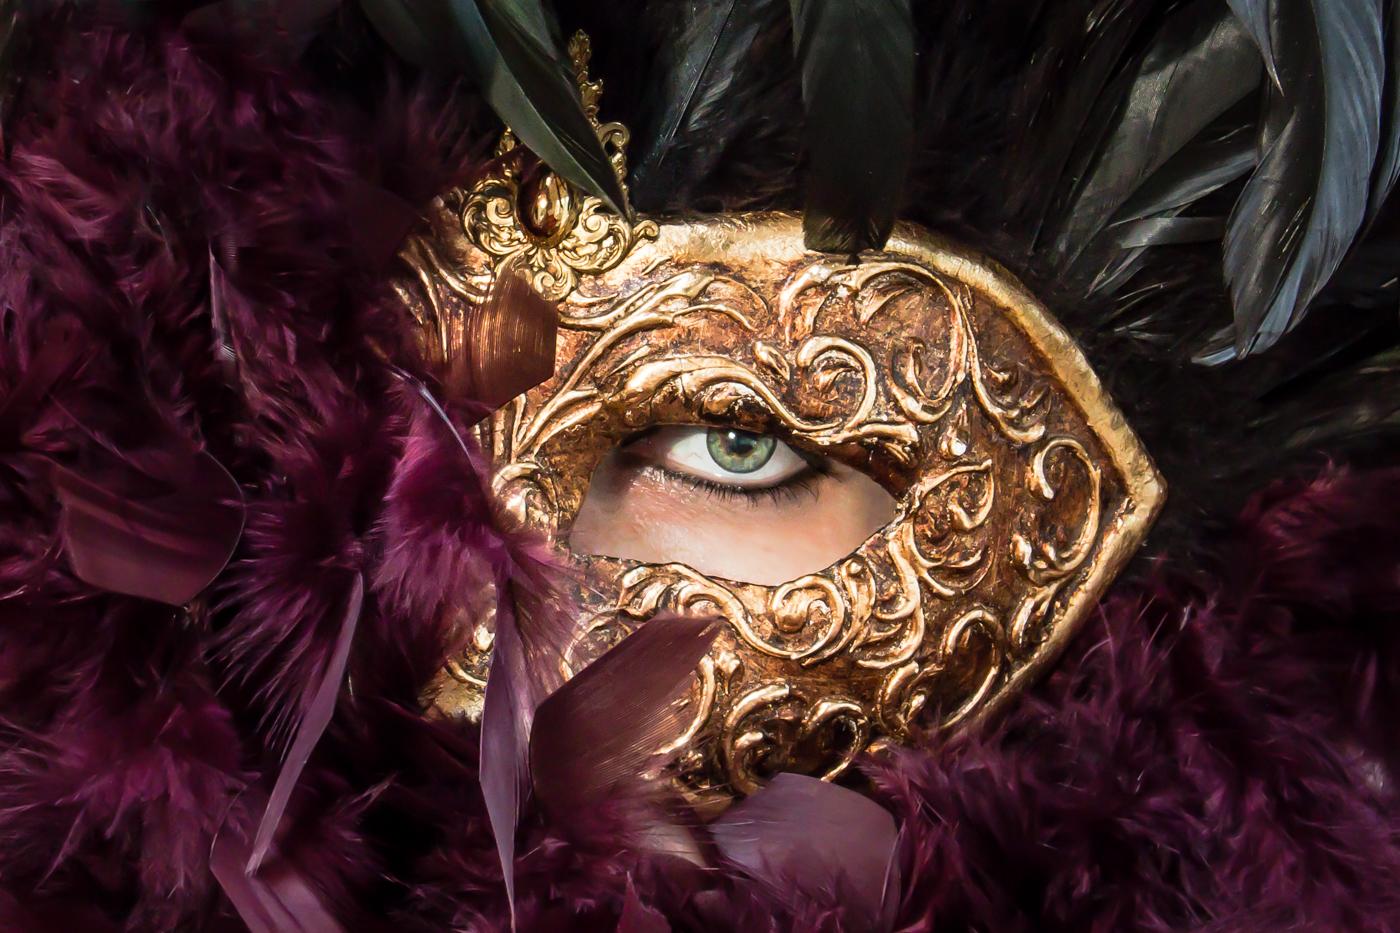 First 'Masked' by Jane Osborne